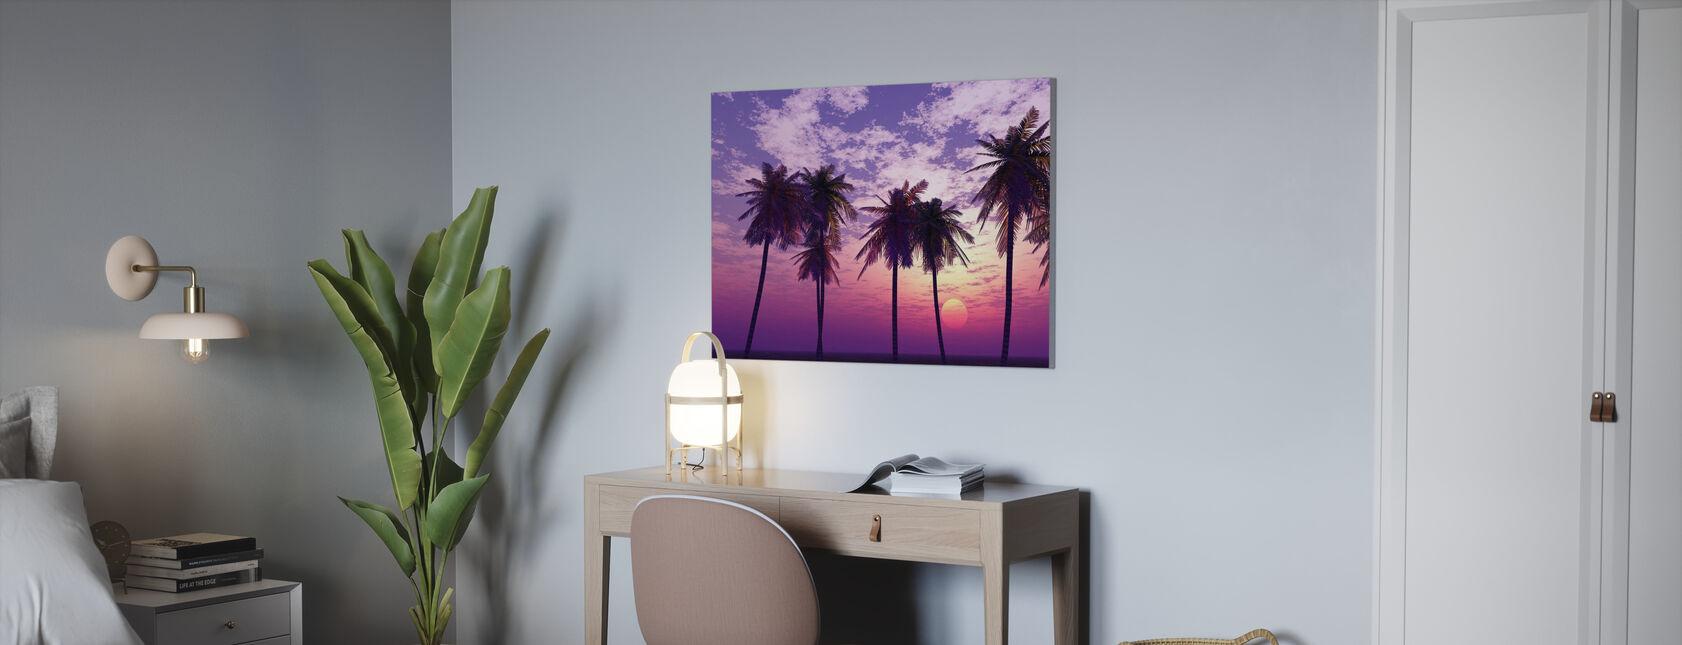 Beautiful Sunset - Canvas print - Office